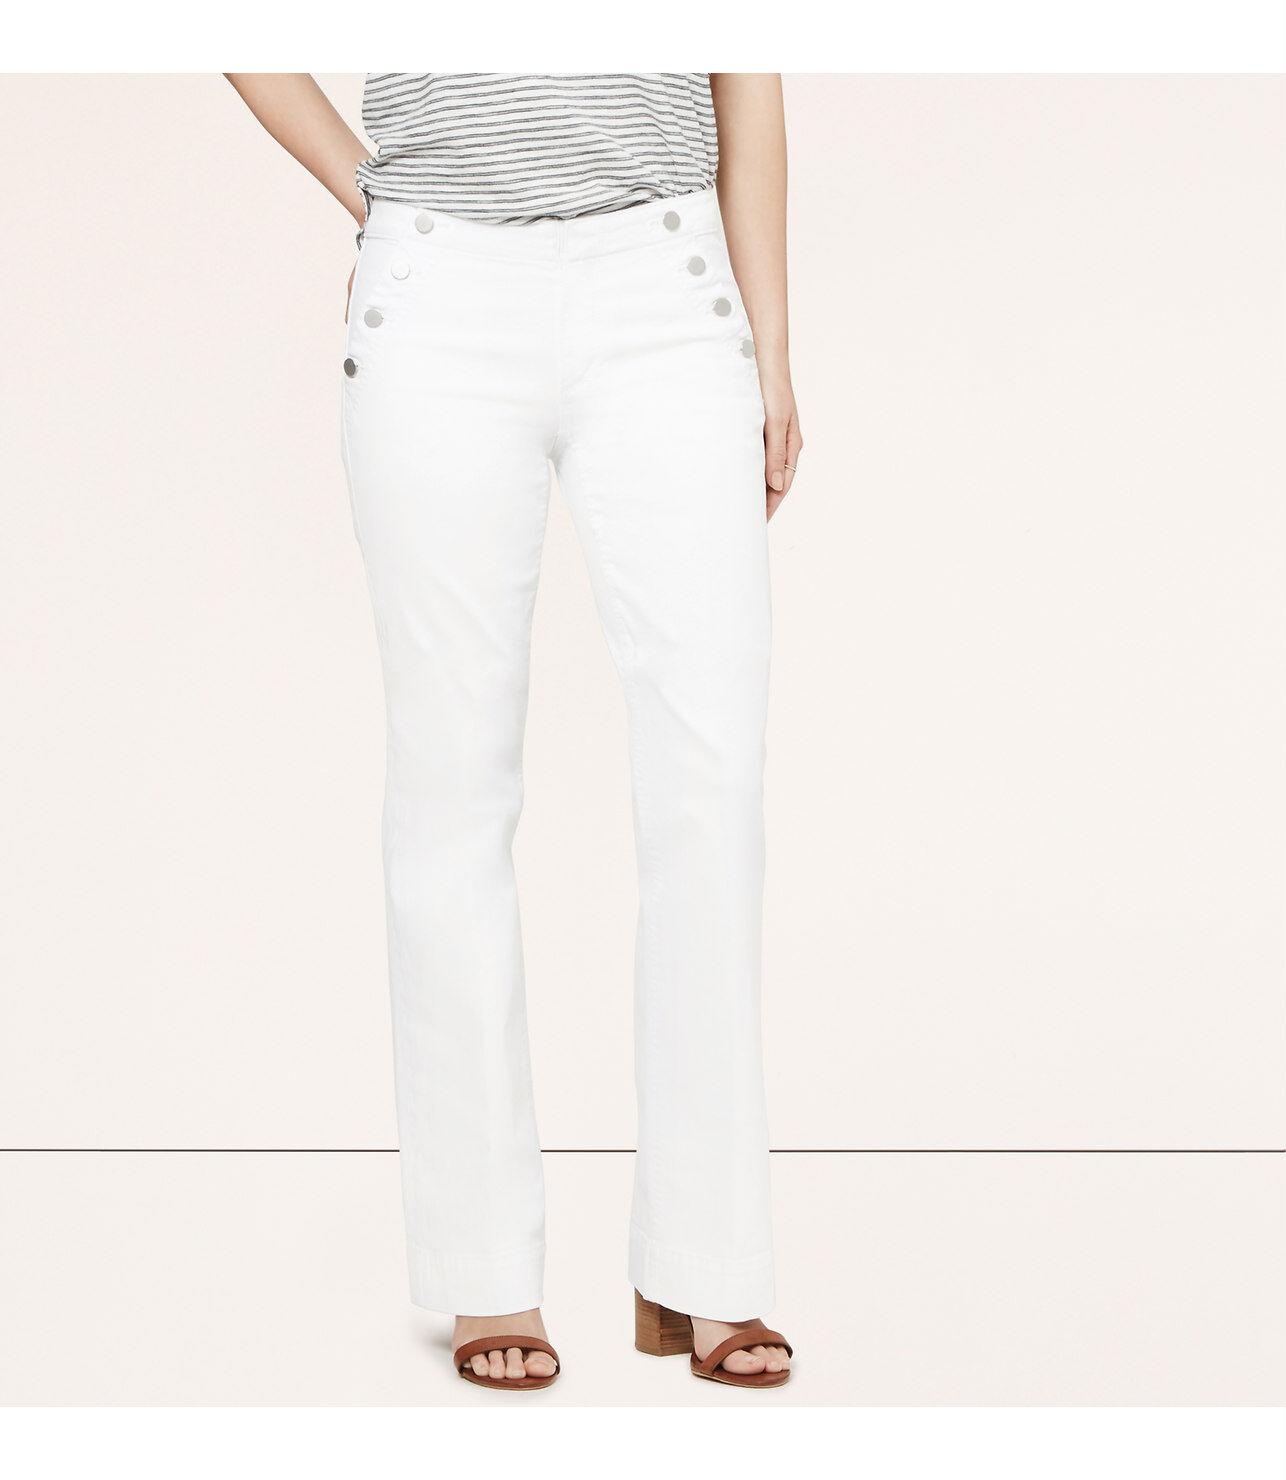 Ann Taylor LOFT Curvy Sailor Trouser Jeans Pants in White Size 31 12P NWT